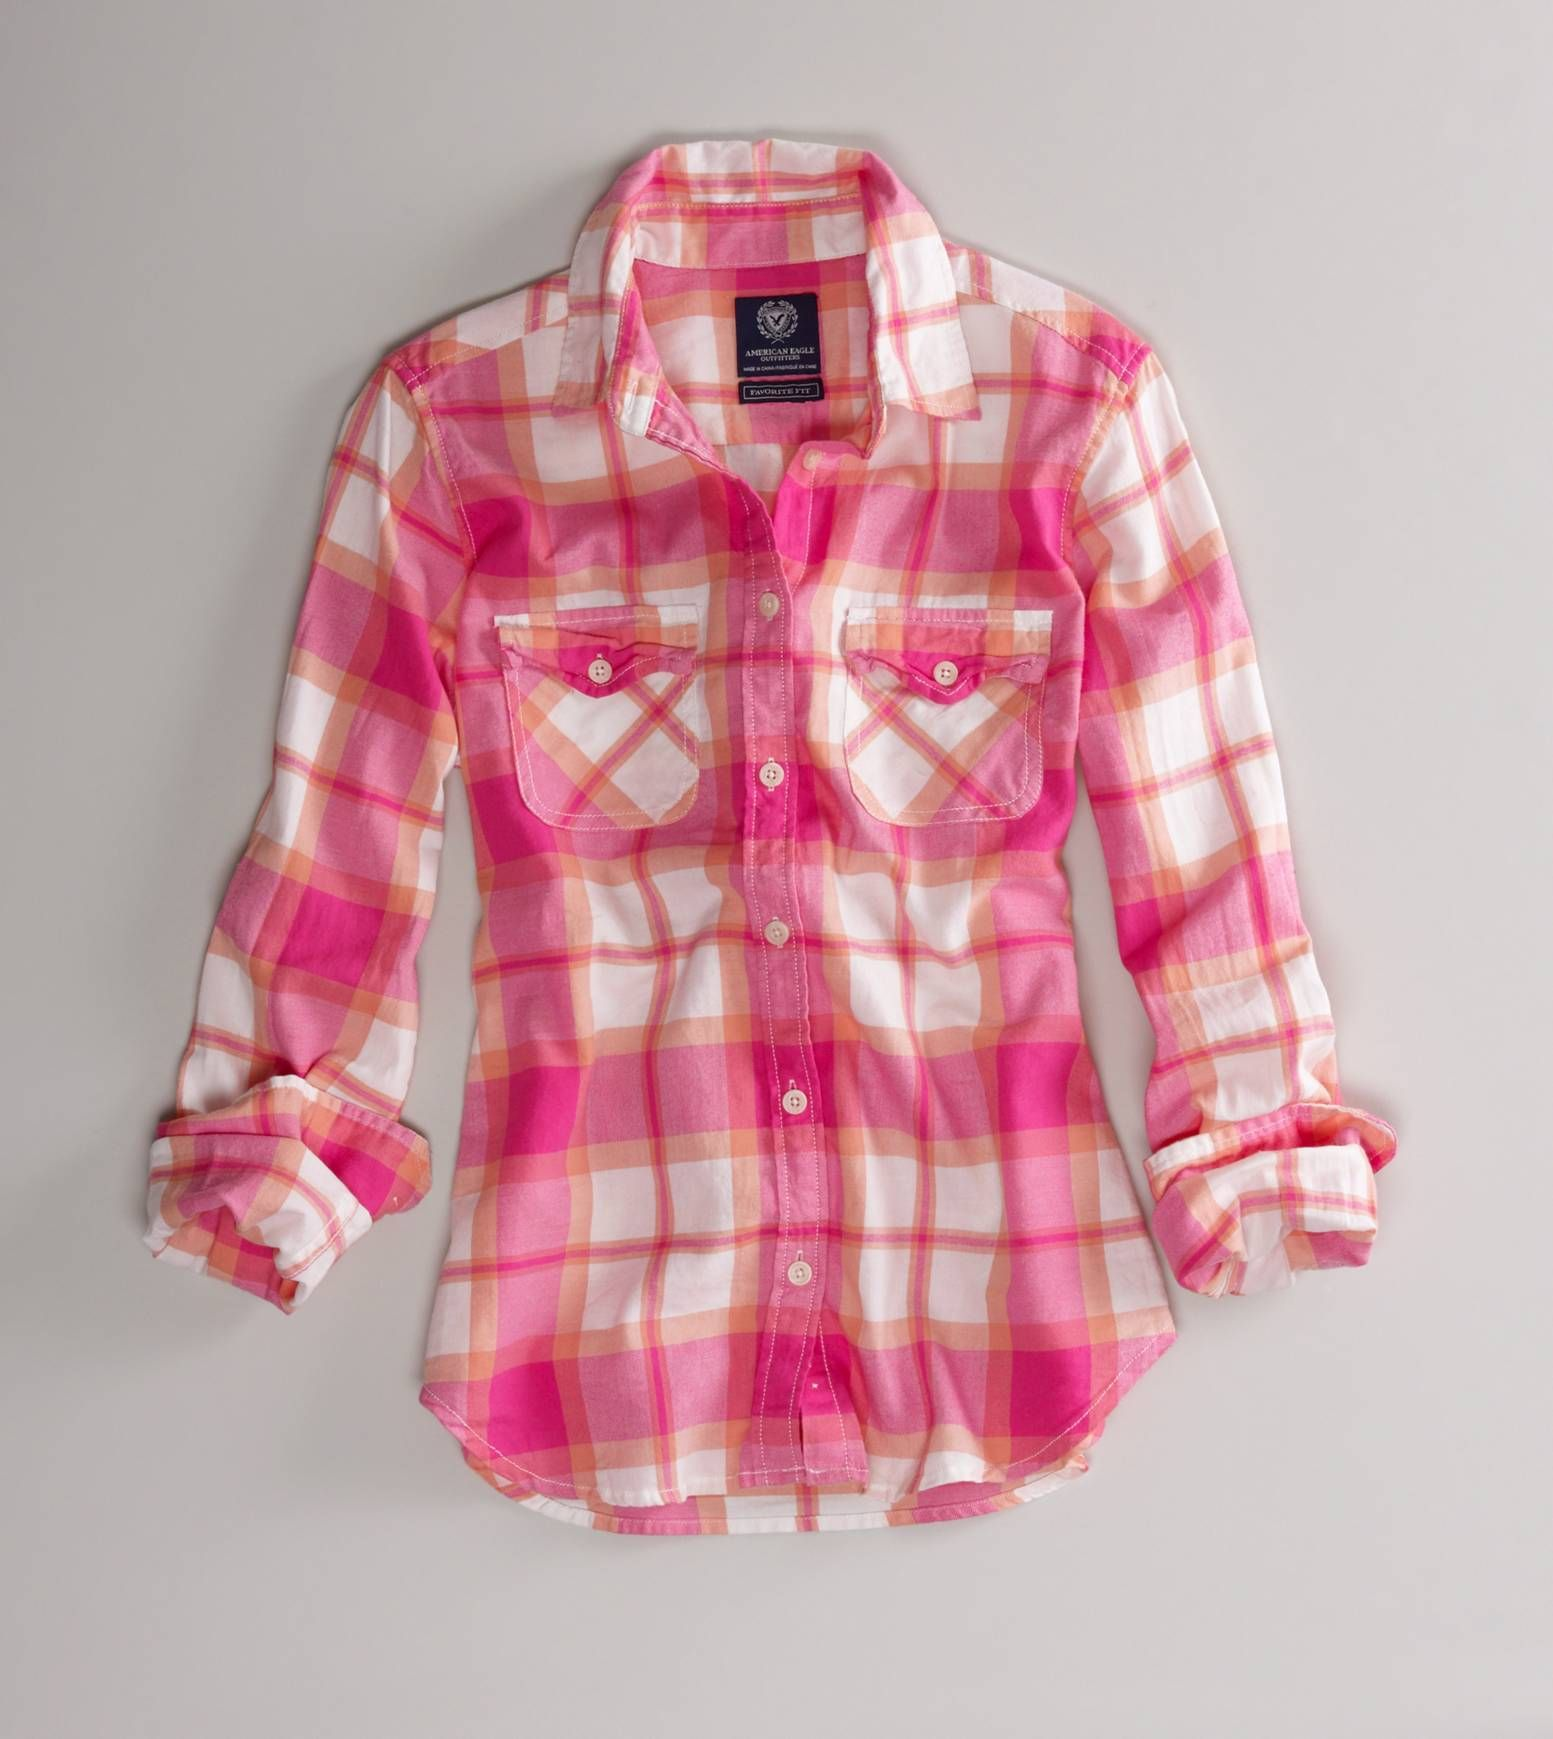 AEO One Shoulder Chambray Shirt. Pink Plaid ... - AEO One Shoulder Chambray Shirt Plaid, Purple And Flannel Shirts